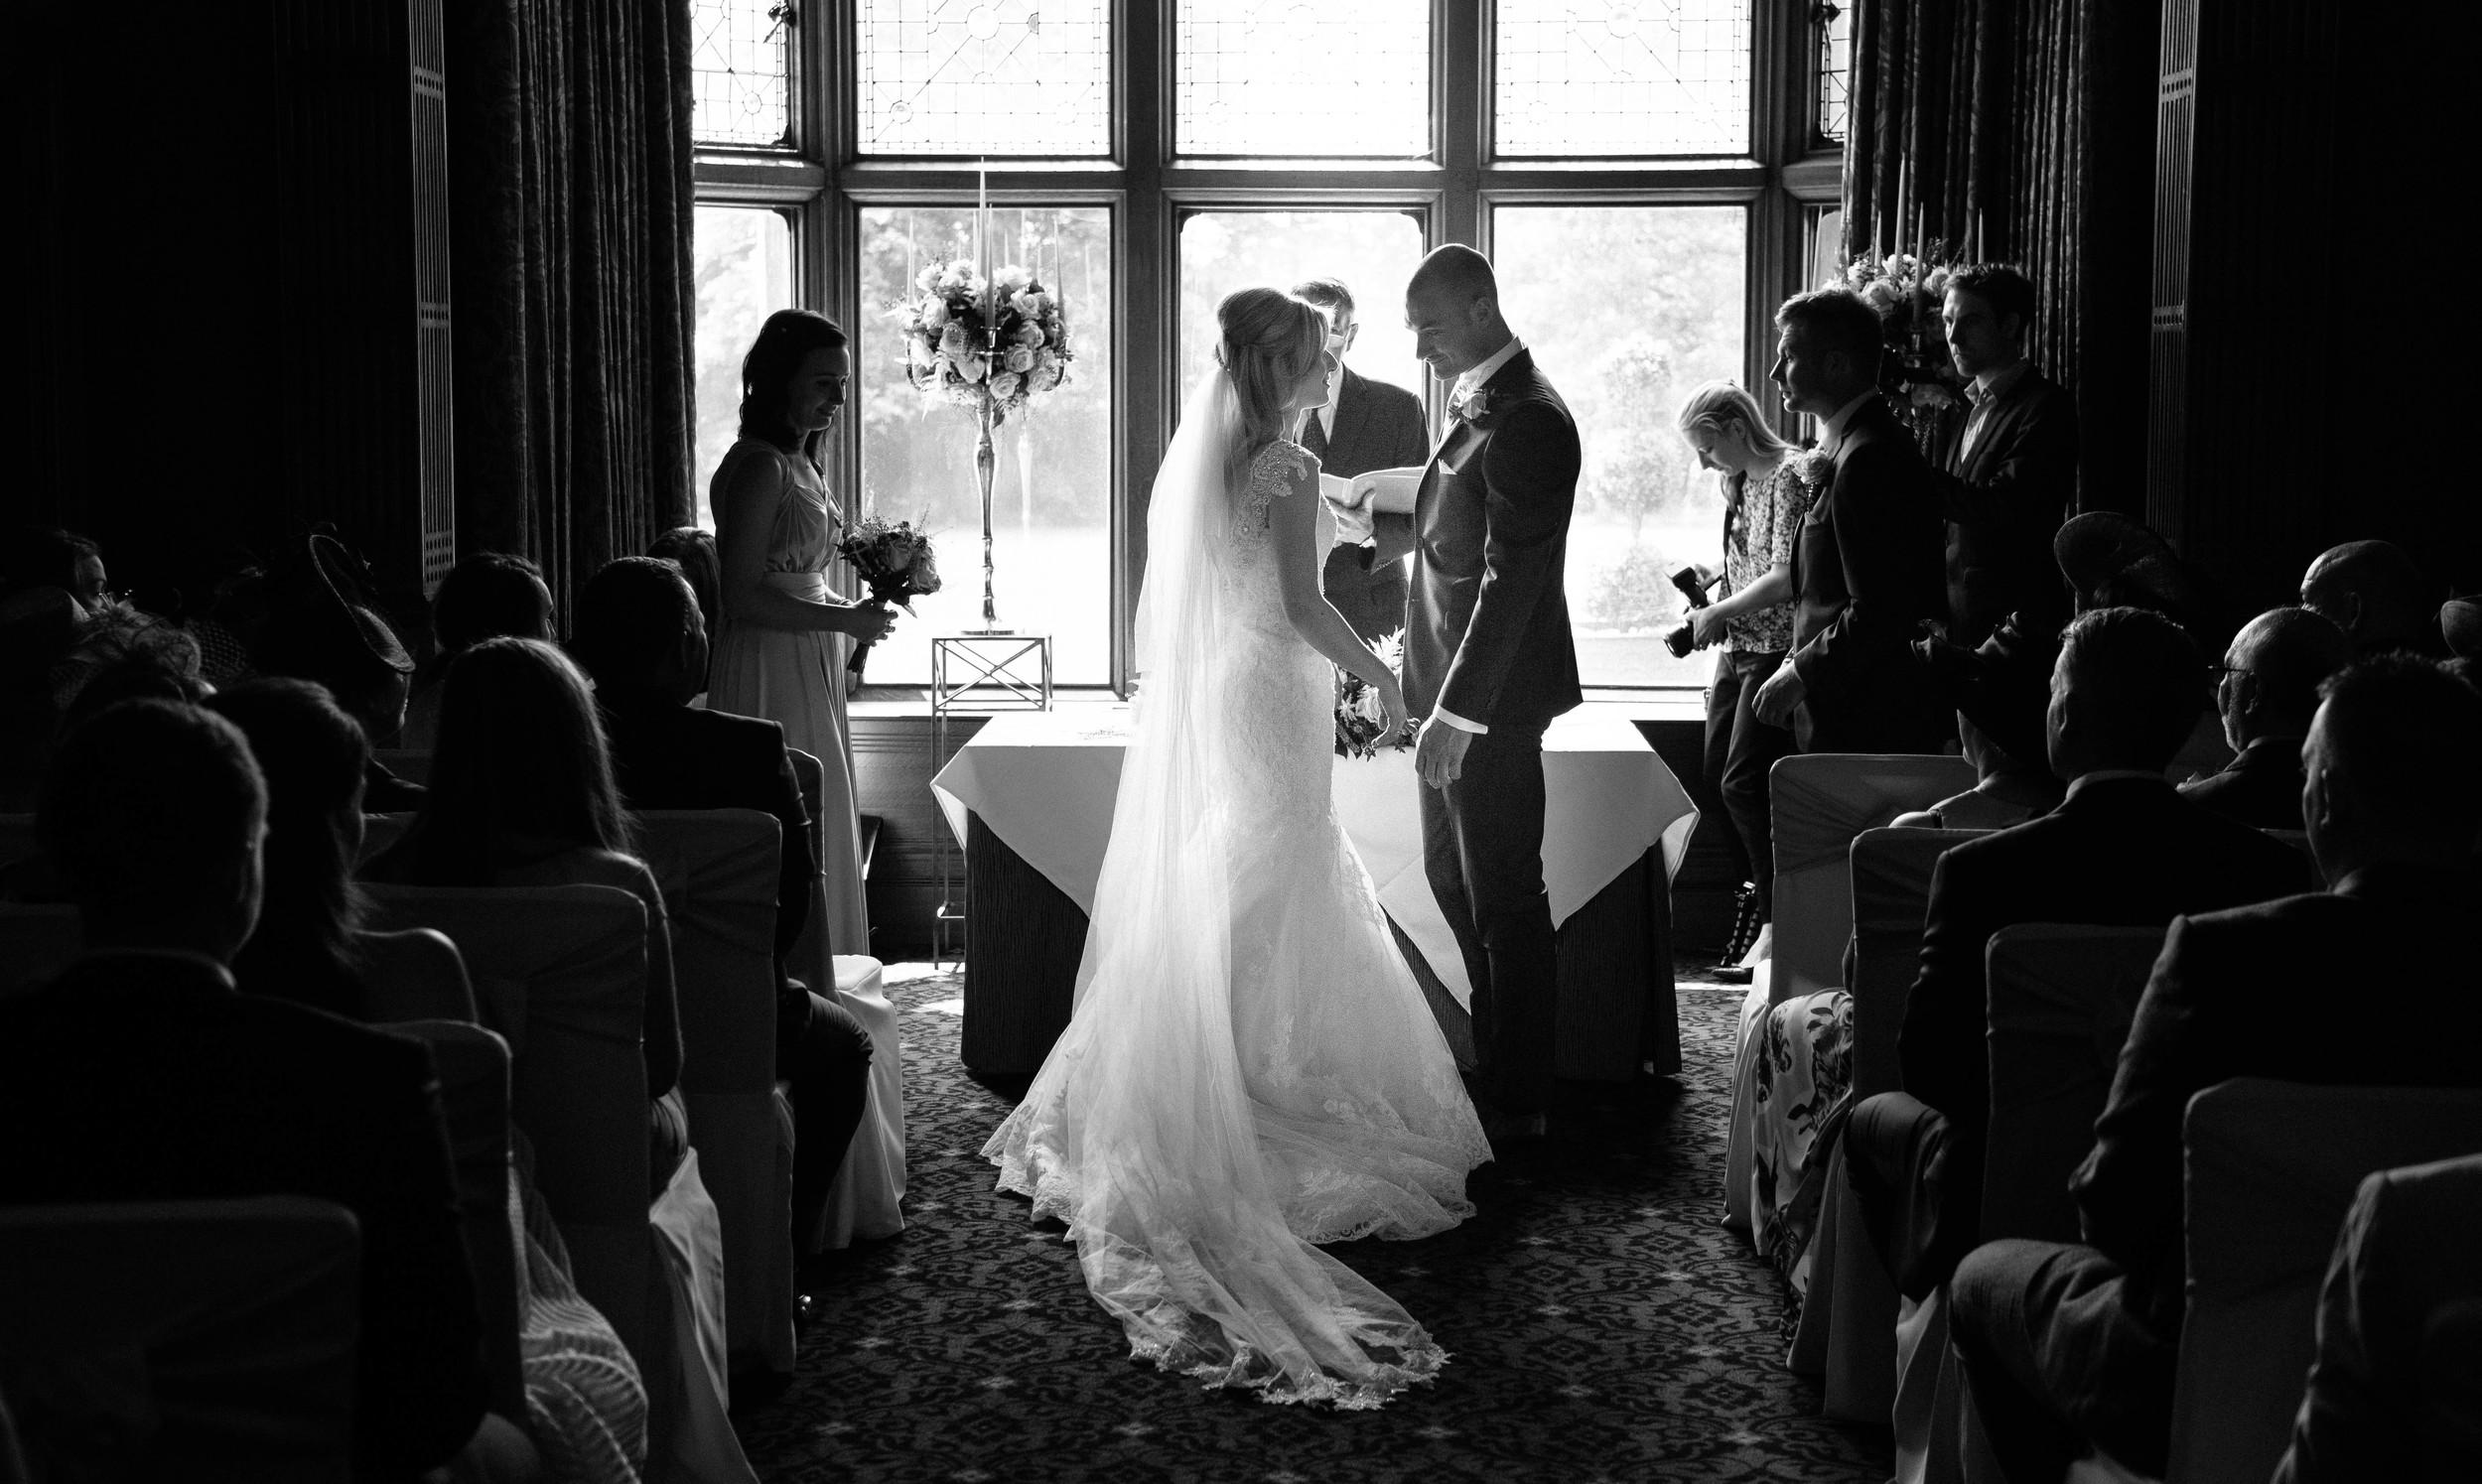 Woodlands-Park-Hotel-Cobham-Surrey-wedding-16